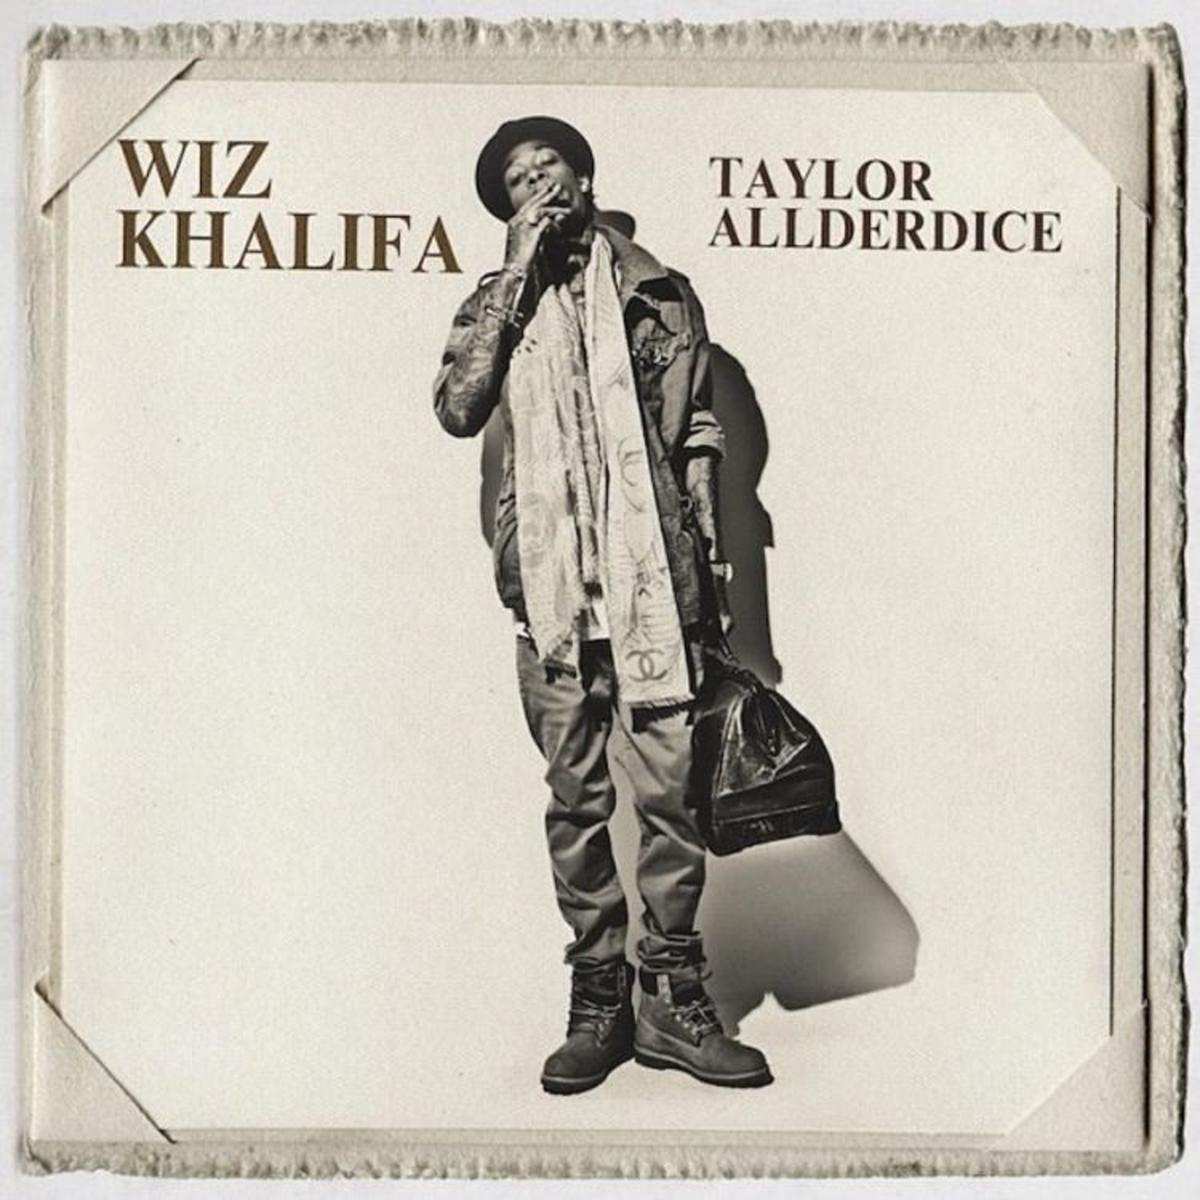 Wiz Khalifa Ft. Juicy J – Blindfolds mp3 download